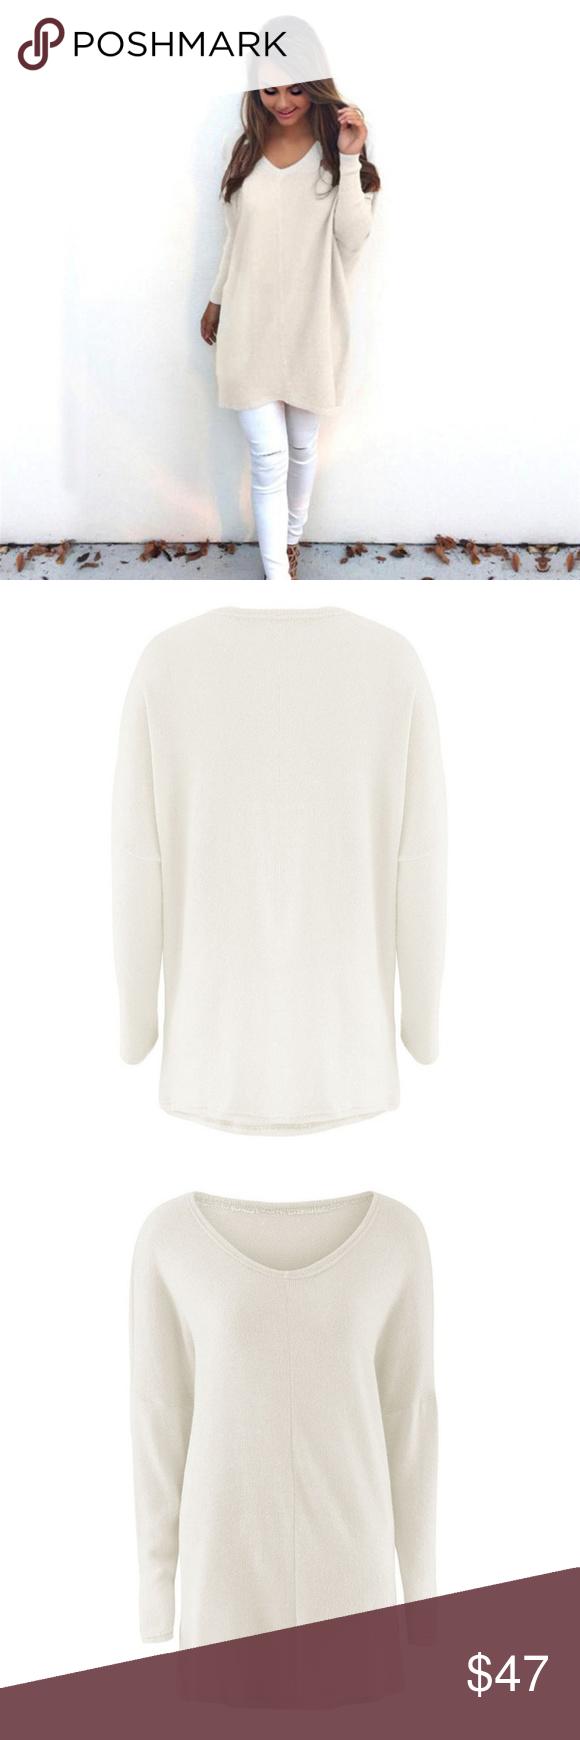 Oversized Beige V-Neck Sweater **2 LEFT**NWT Boutique